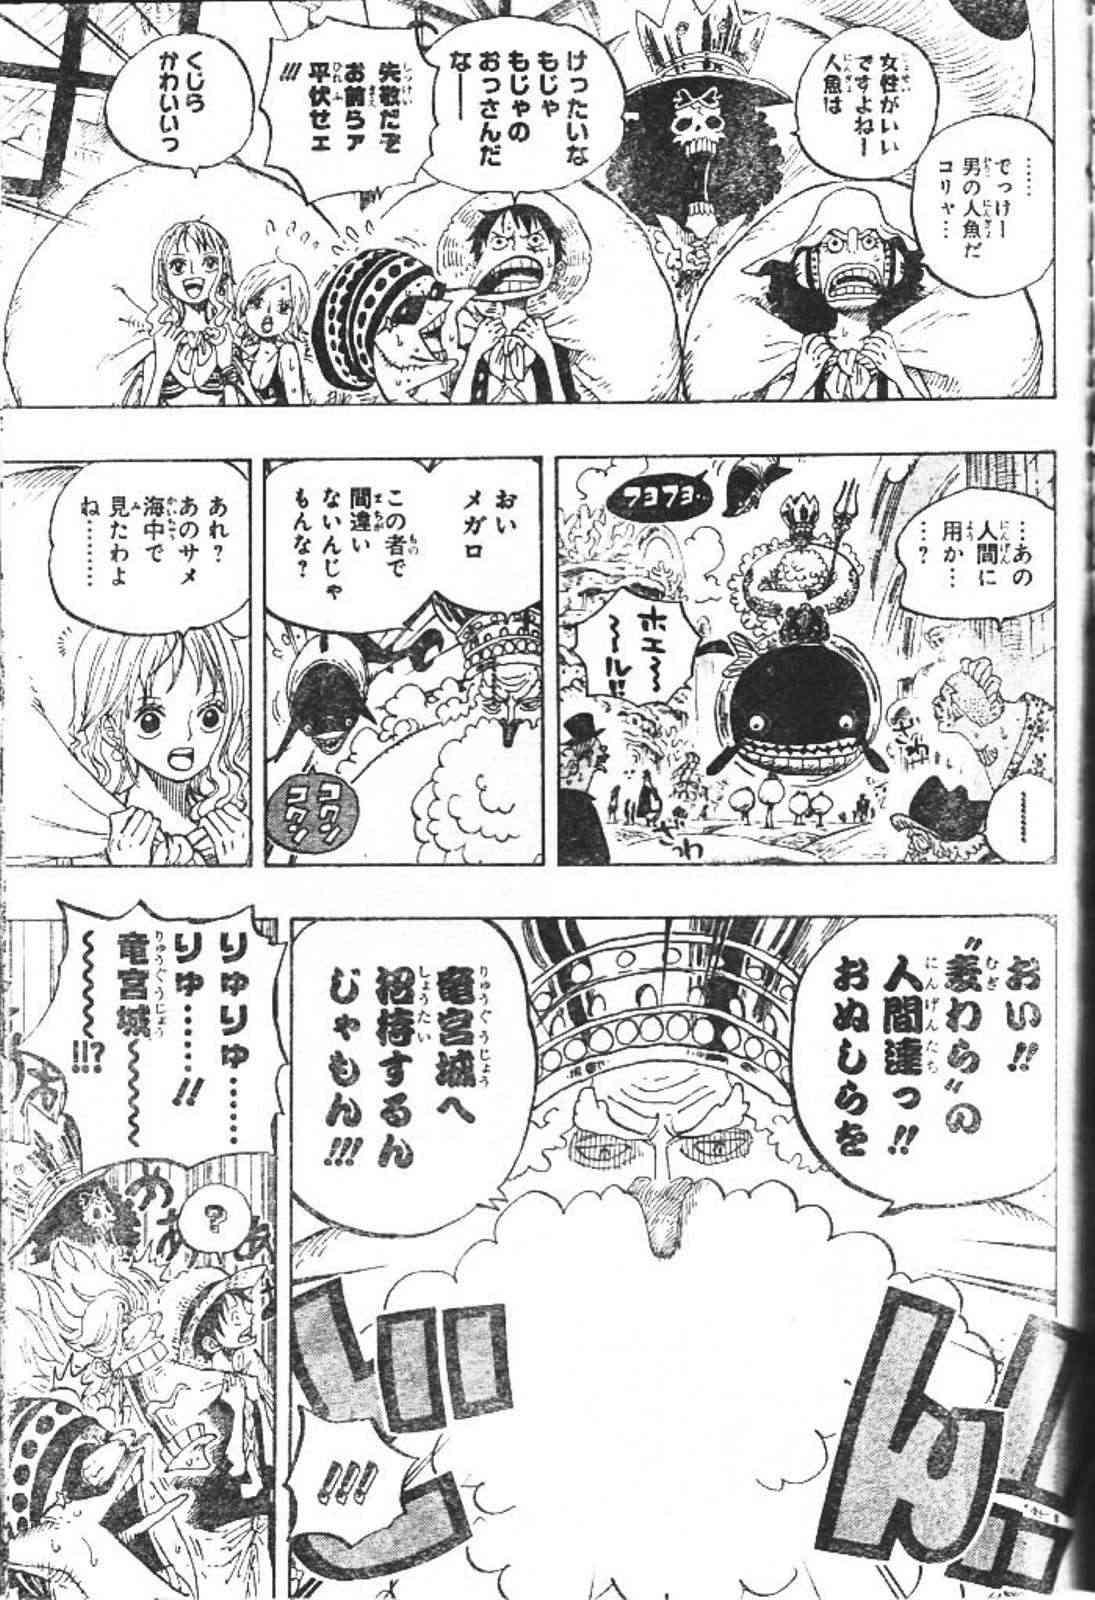 One Piece Manga 611 Spoiler Pics 11_raw10